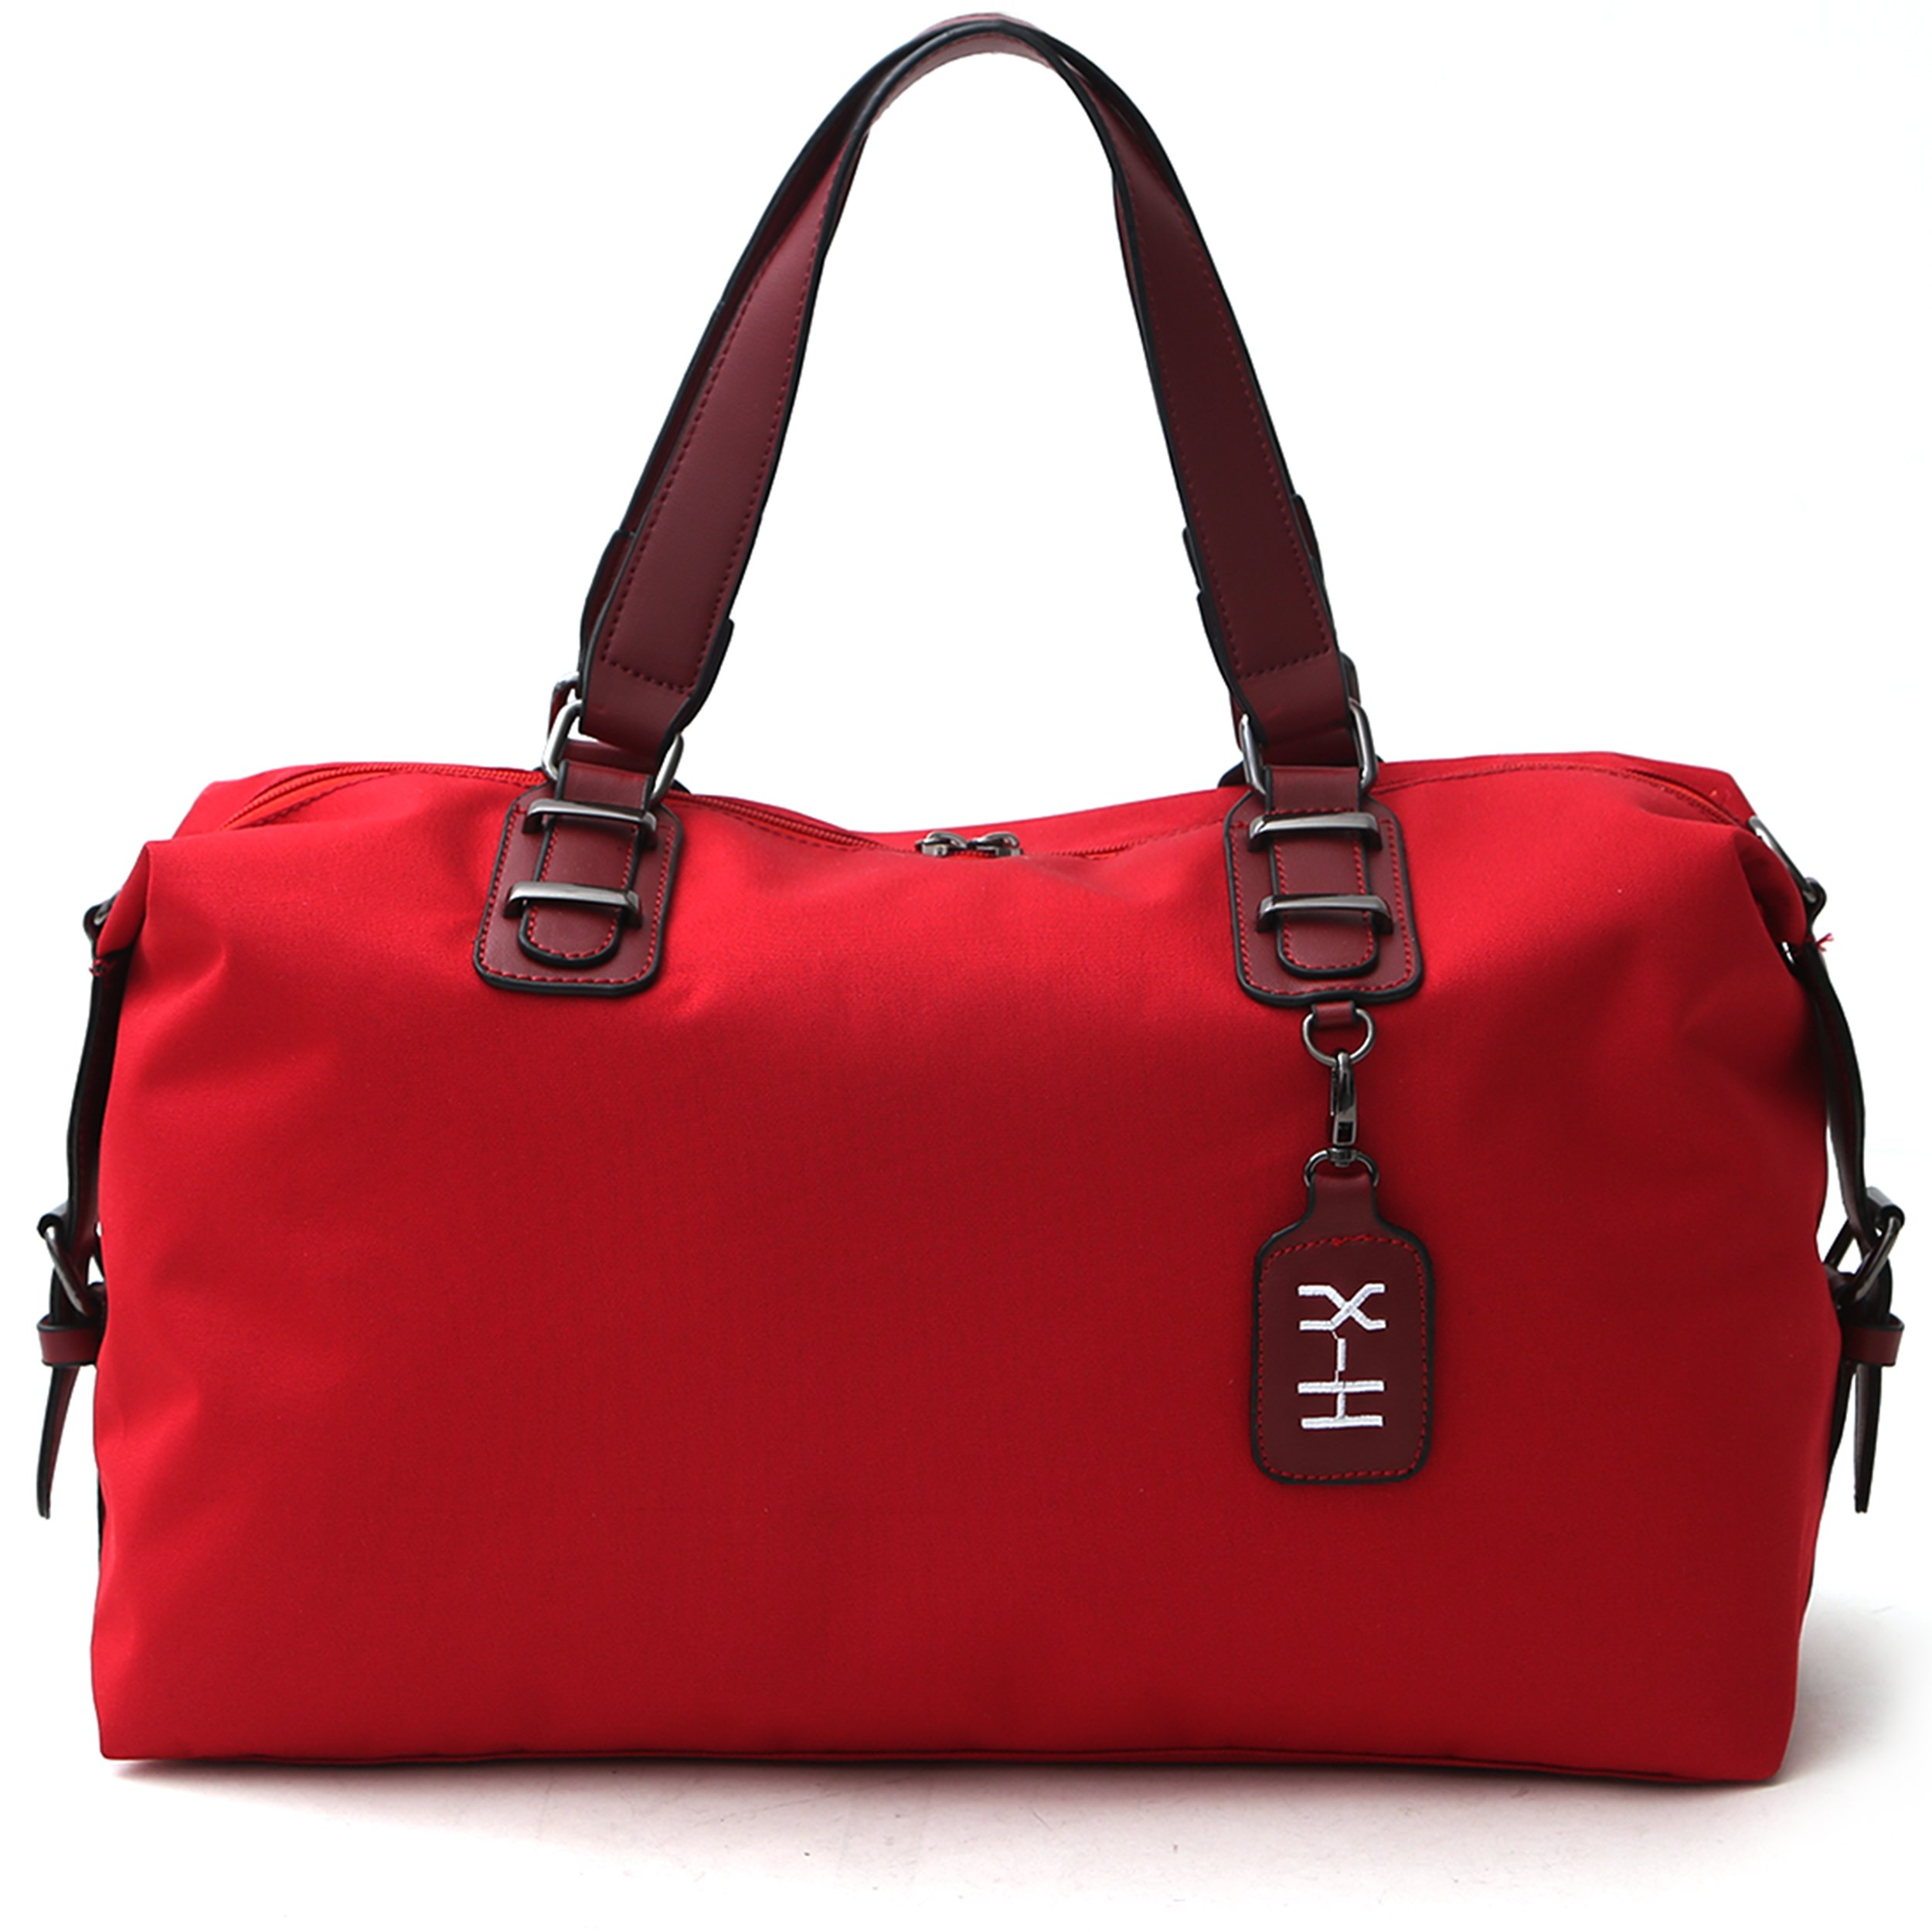 SENLI Travel Bag Foldable Large Travel Sports Duffel Bag Checked Bag